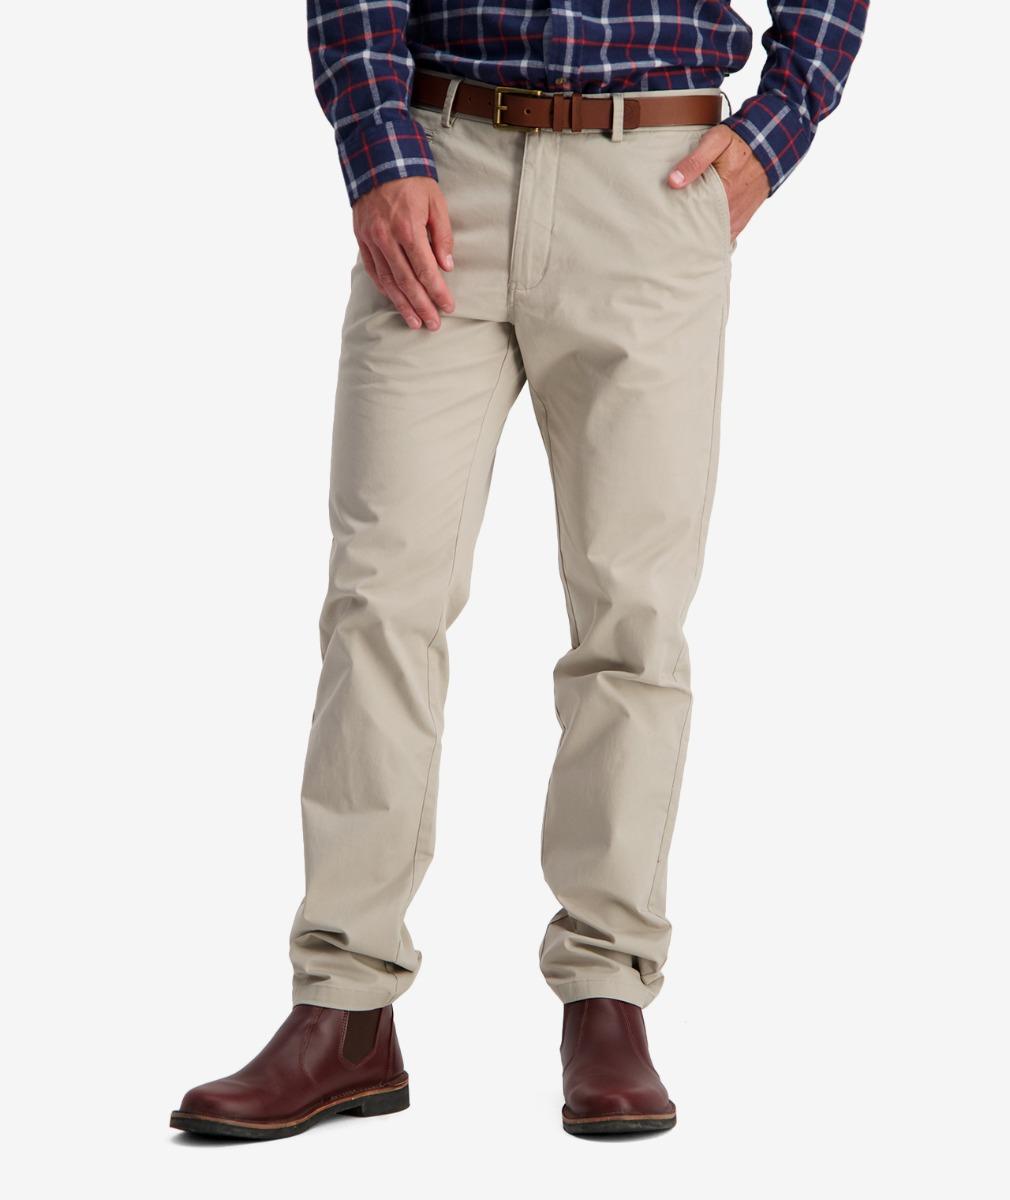 Swanndri Men's Millbrook Chino Pant